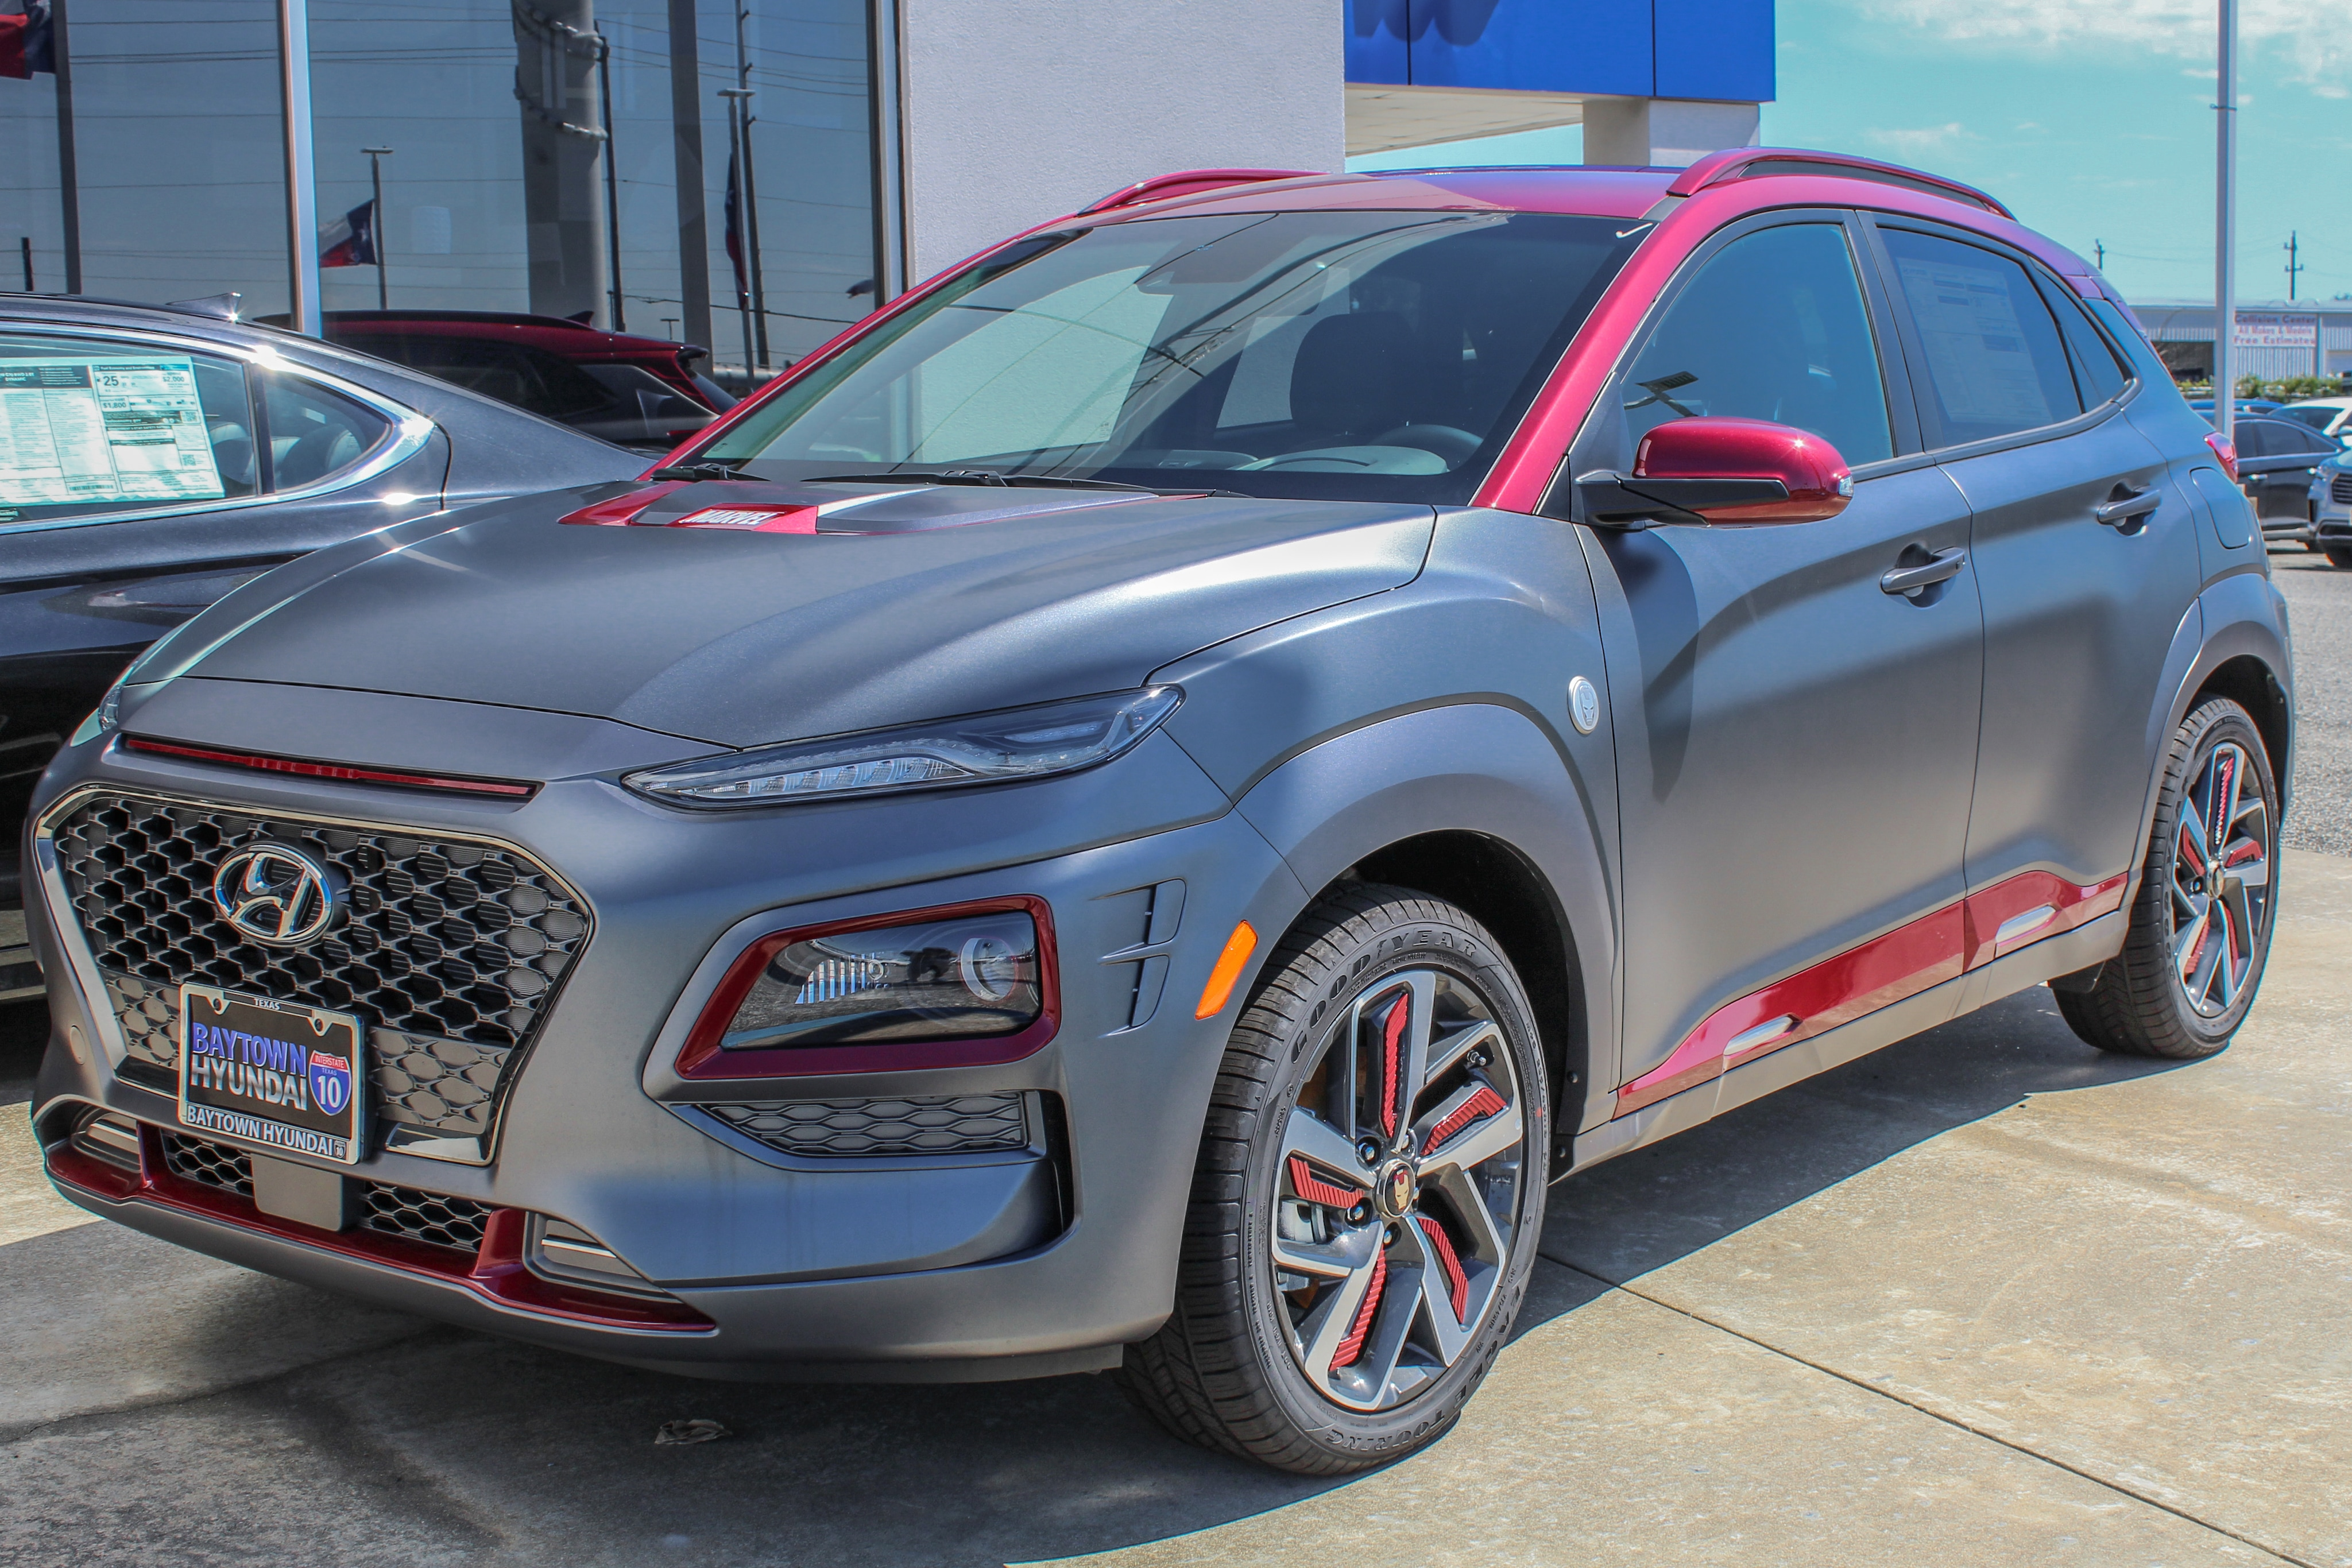 New 2019 Hyundai Kona For Sale At North Freeway Hyundai